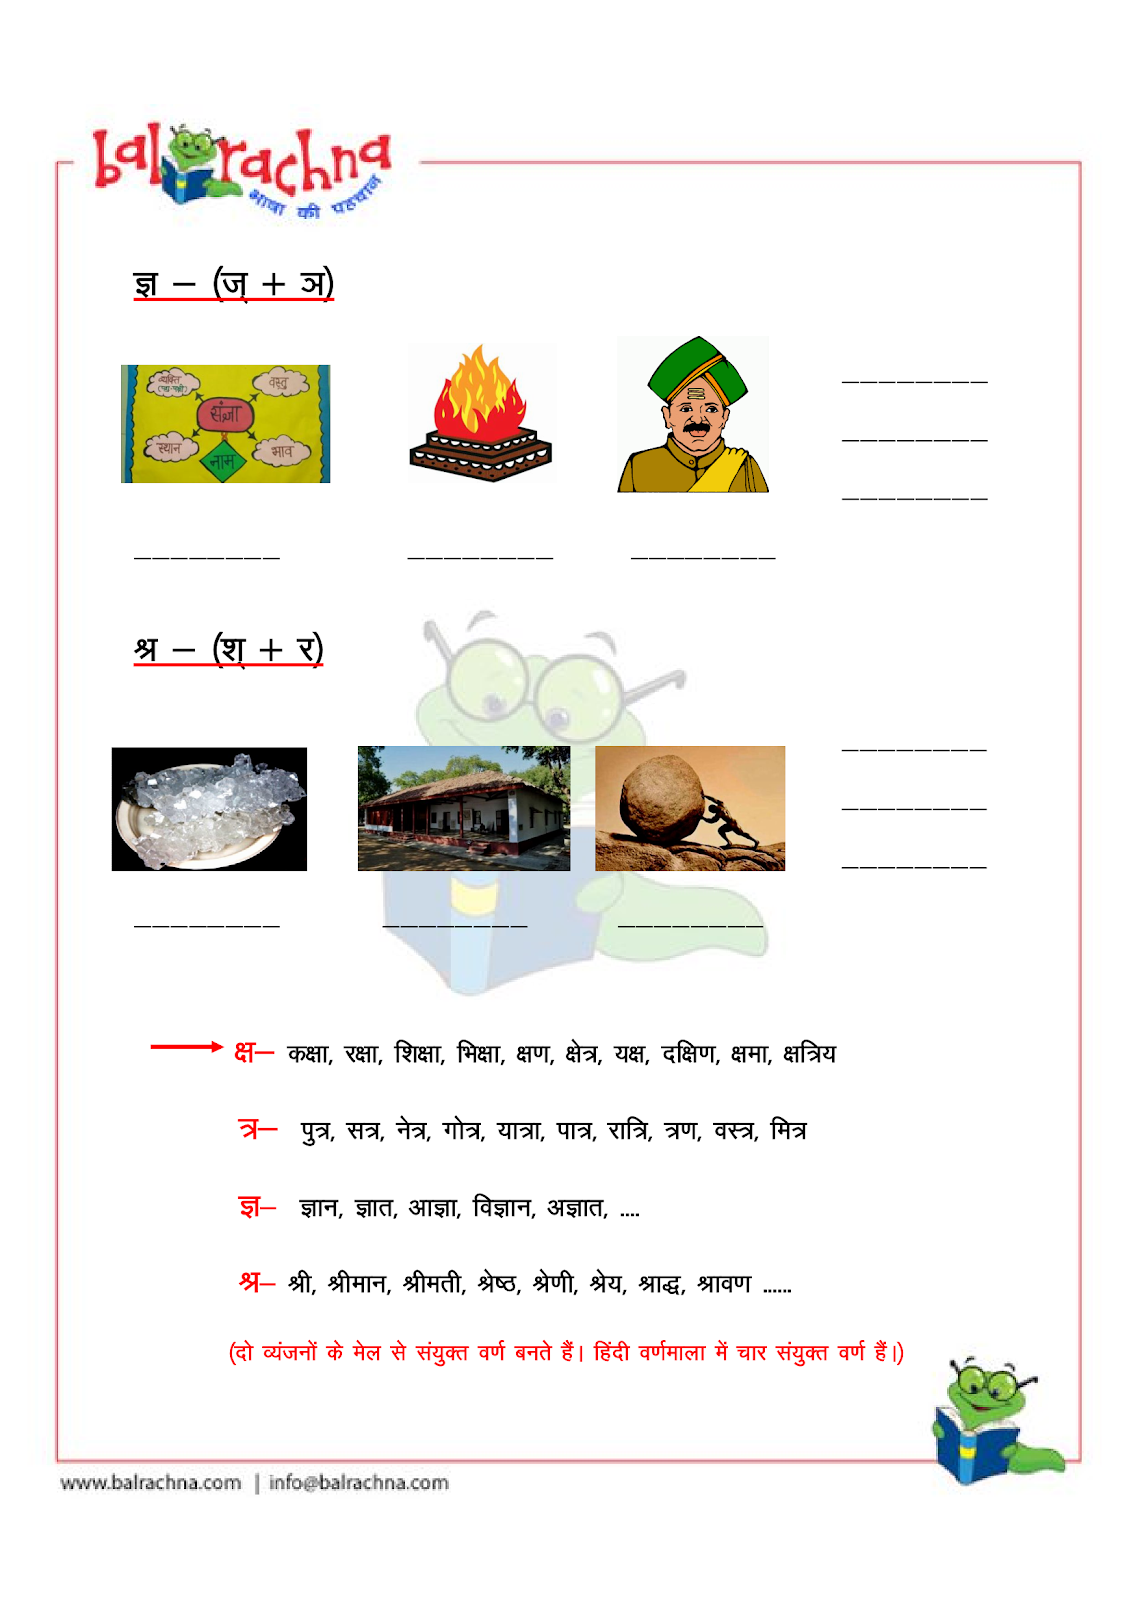 Balrachna Pictorial Worksheets